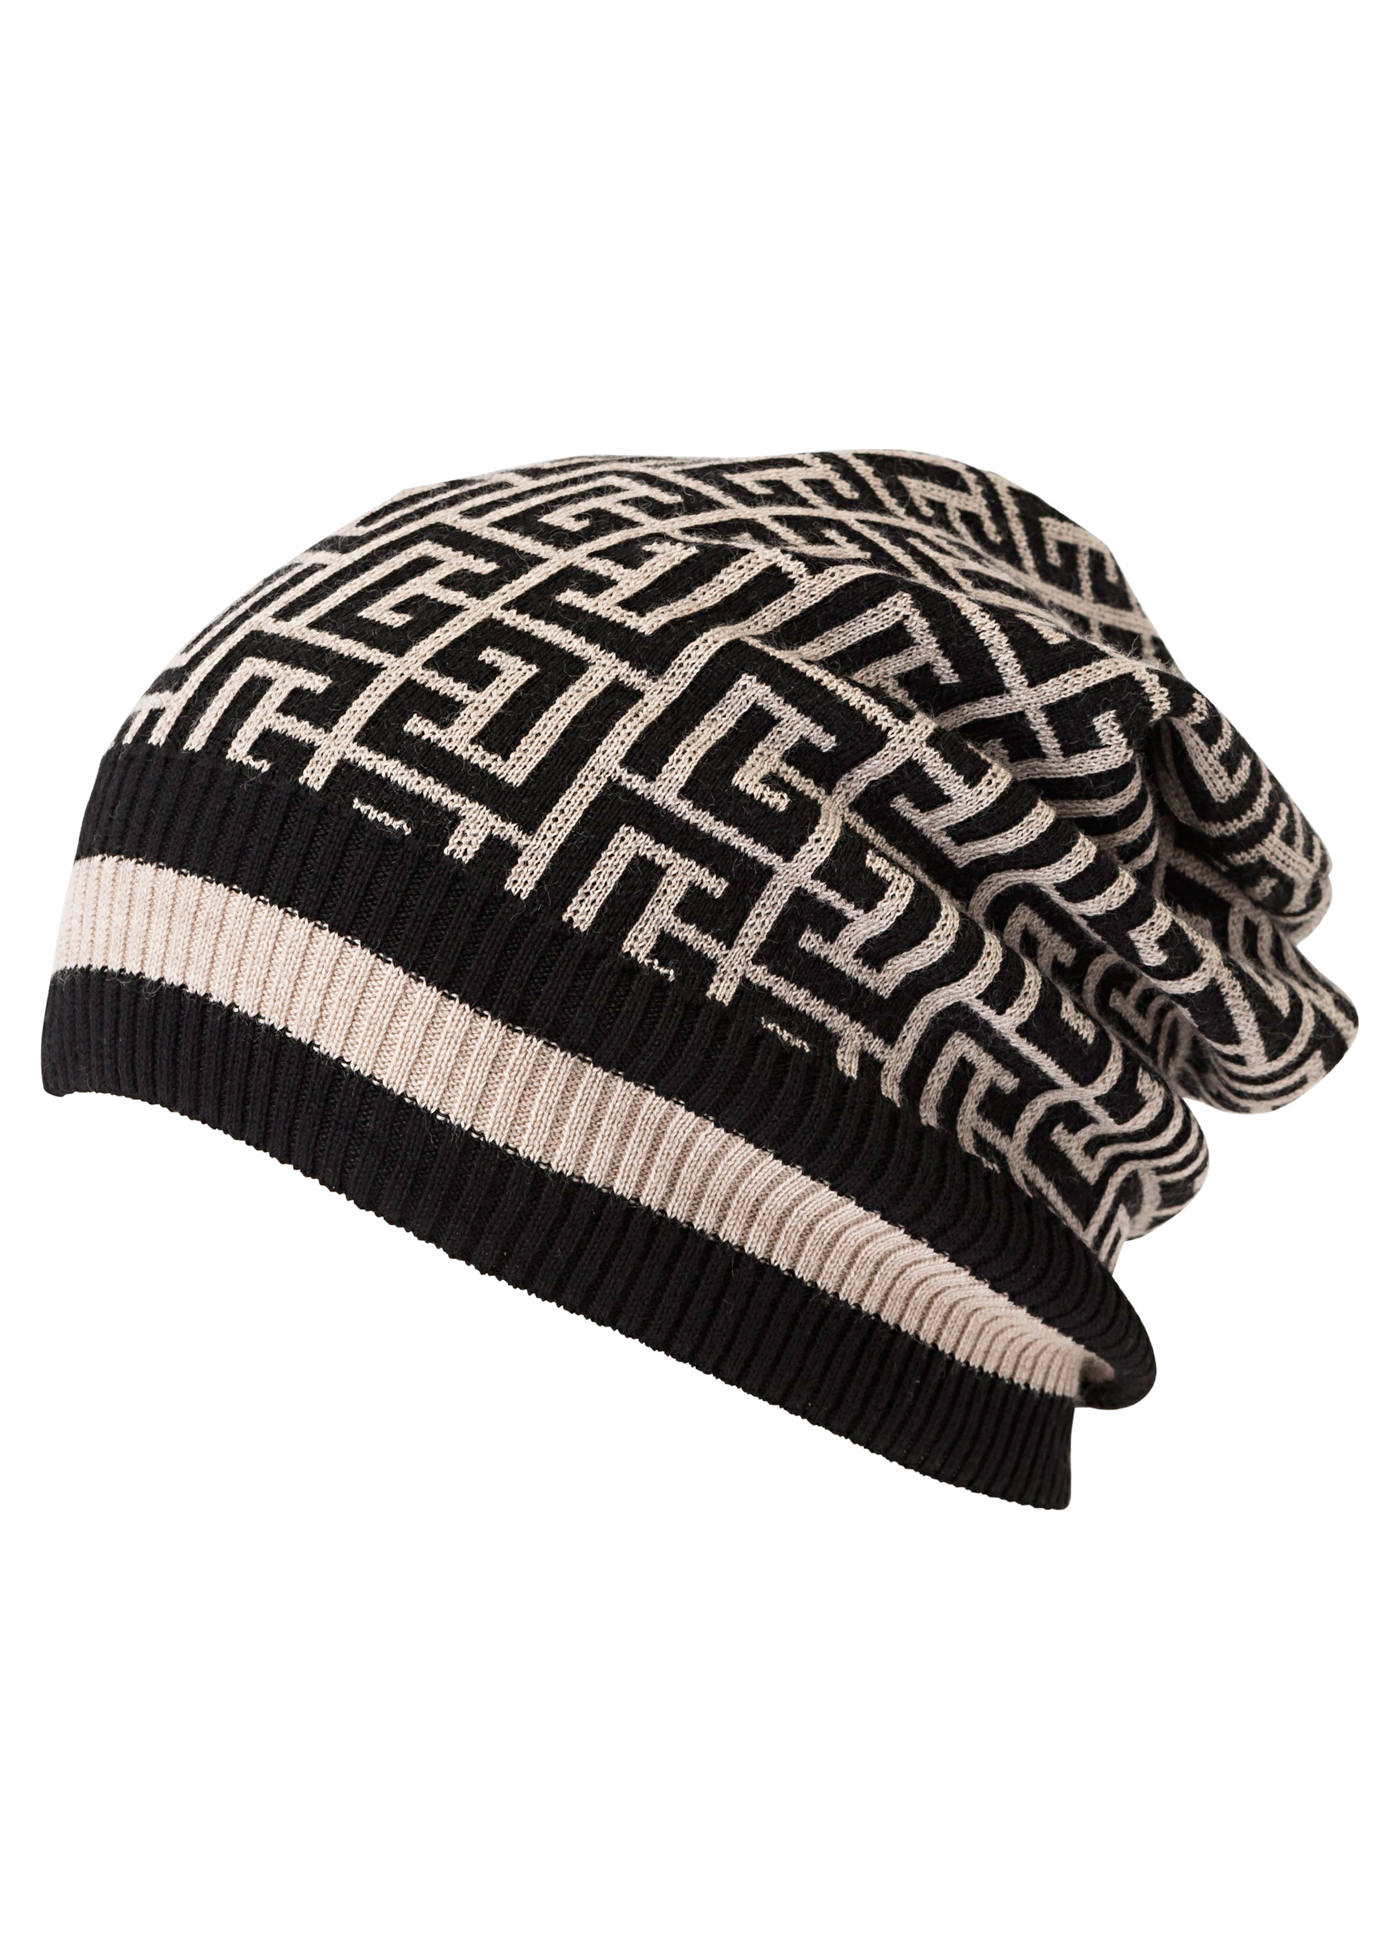 MONOGRAM MERINO KNITTED HAT image number 0